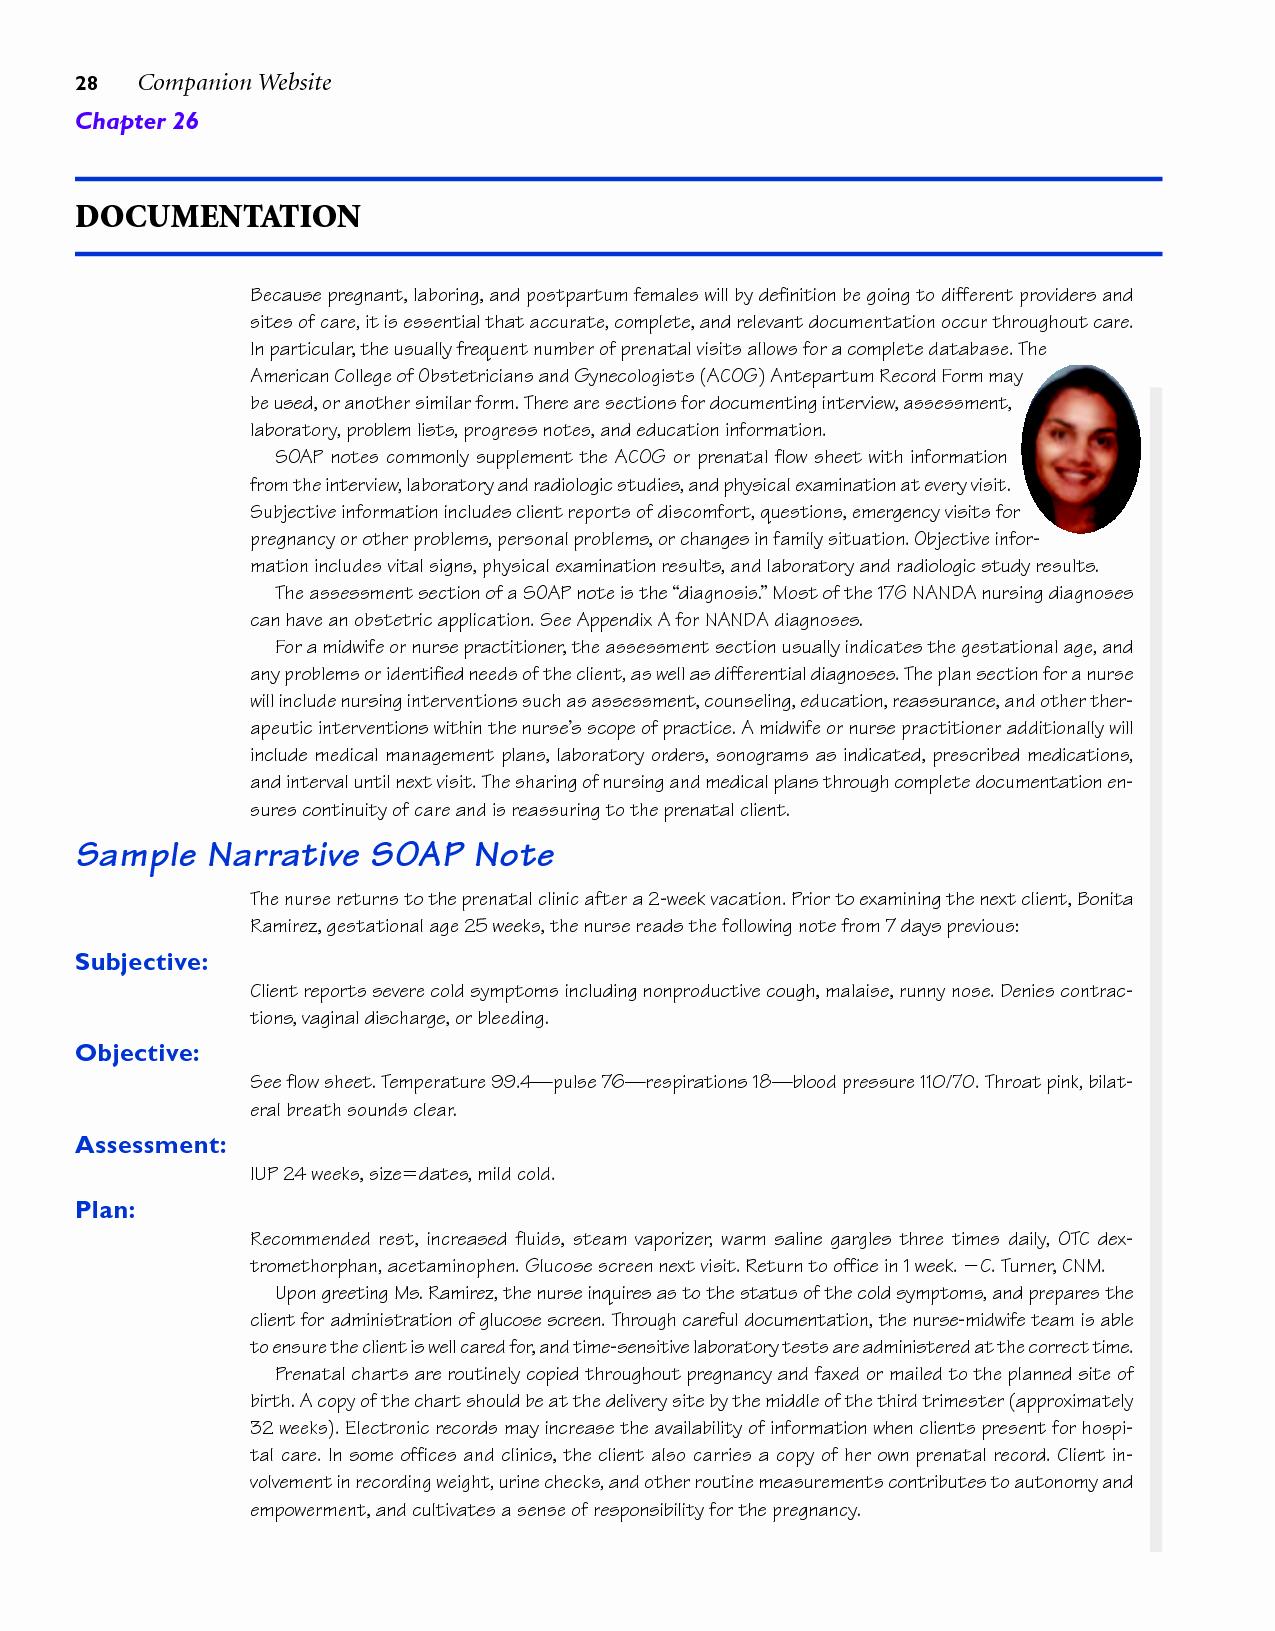 Soap Note Template Nurse Practitioner Inspirational 15 Best Of Nursing assessment Template Worksheet